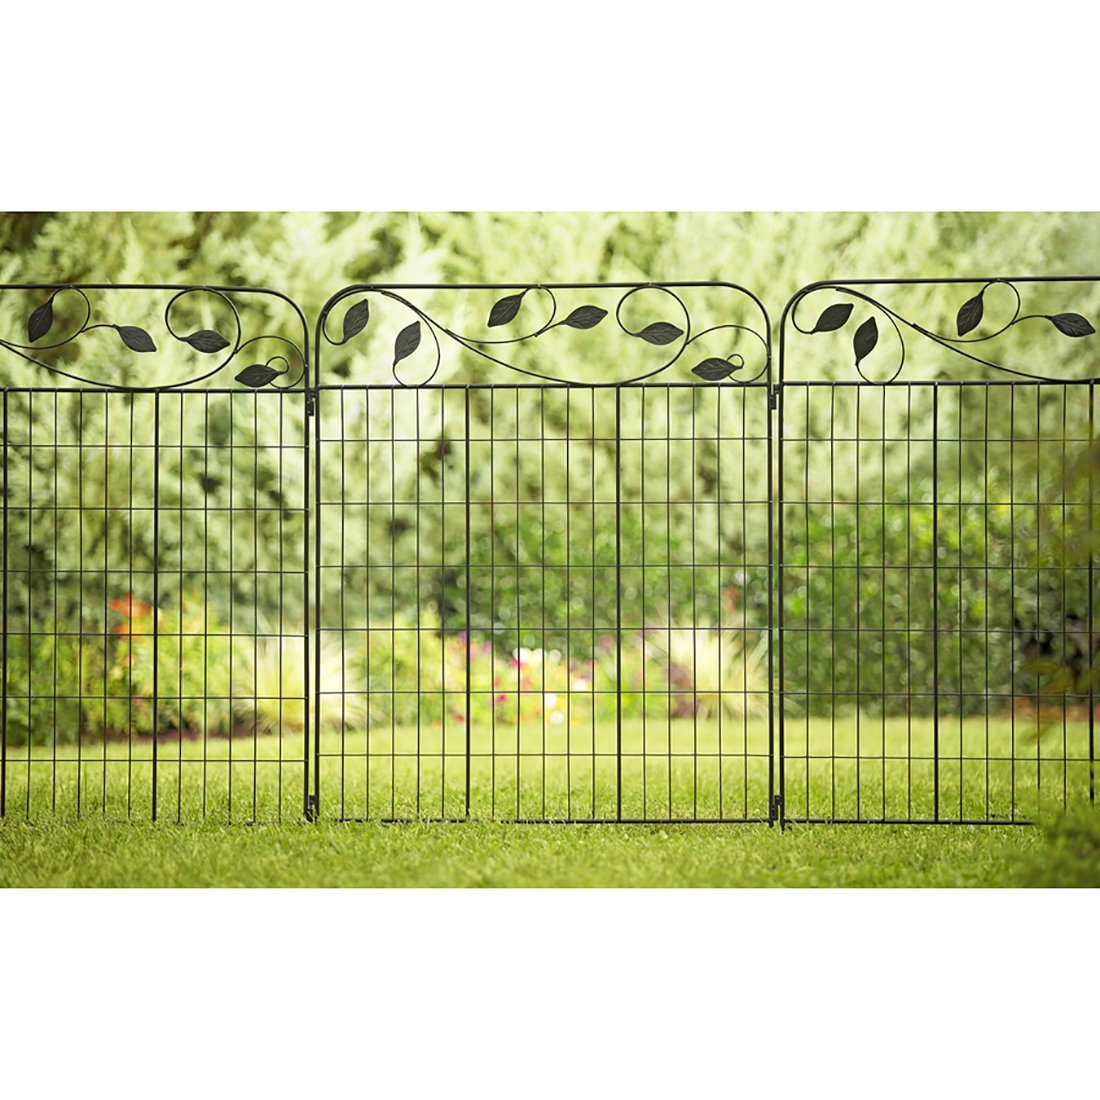 Amazon amagabeli decorative garden fence 36x 44 x 2 panels amazon amagabeli decorative garden fence 36x 44 x 2 panels metal wire fencing outdoor patio decor landscape folding black wrought iron border edging baanklon Gallery